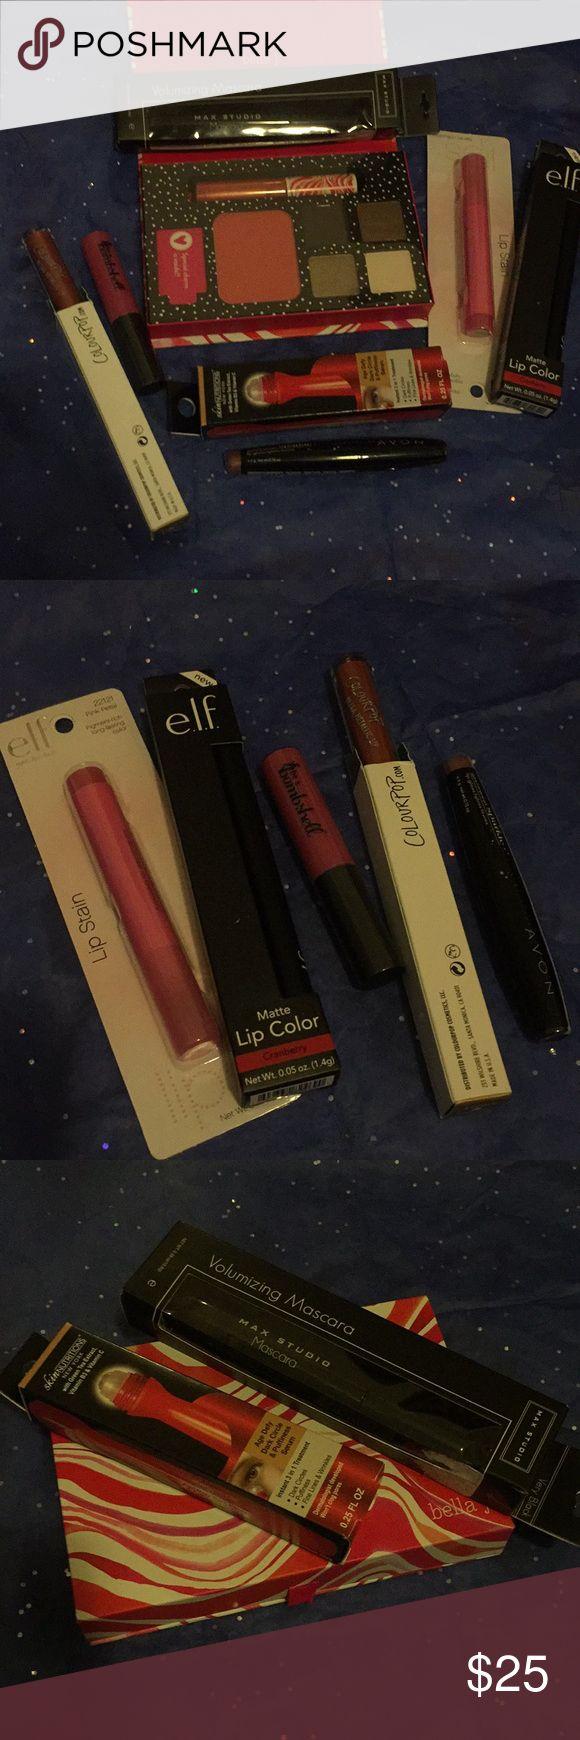 Big bundle of makeup -eyeshadow/blush/lip pallette (Bella j) -elf lip stain and matte lip color -bombshell lip gloss, Avon sparkly lipgloss  -colourpop lipgloss  -under eye treatment and Mac Studio mascara -free gift Makeup